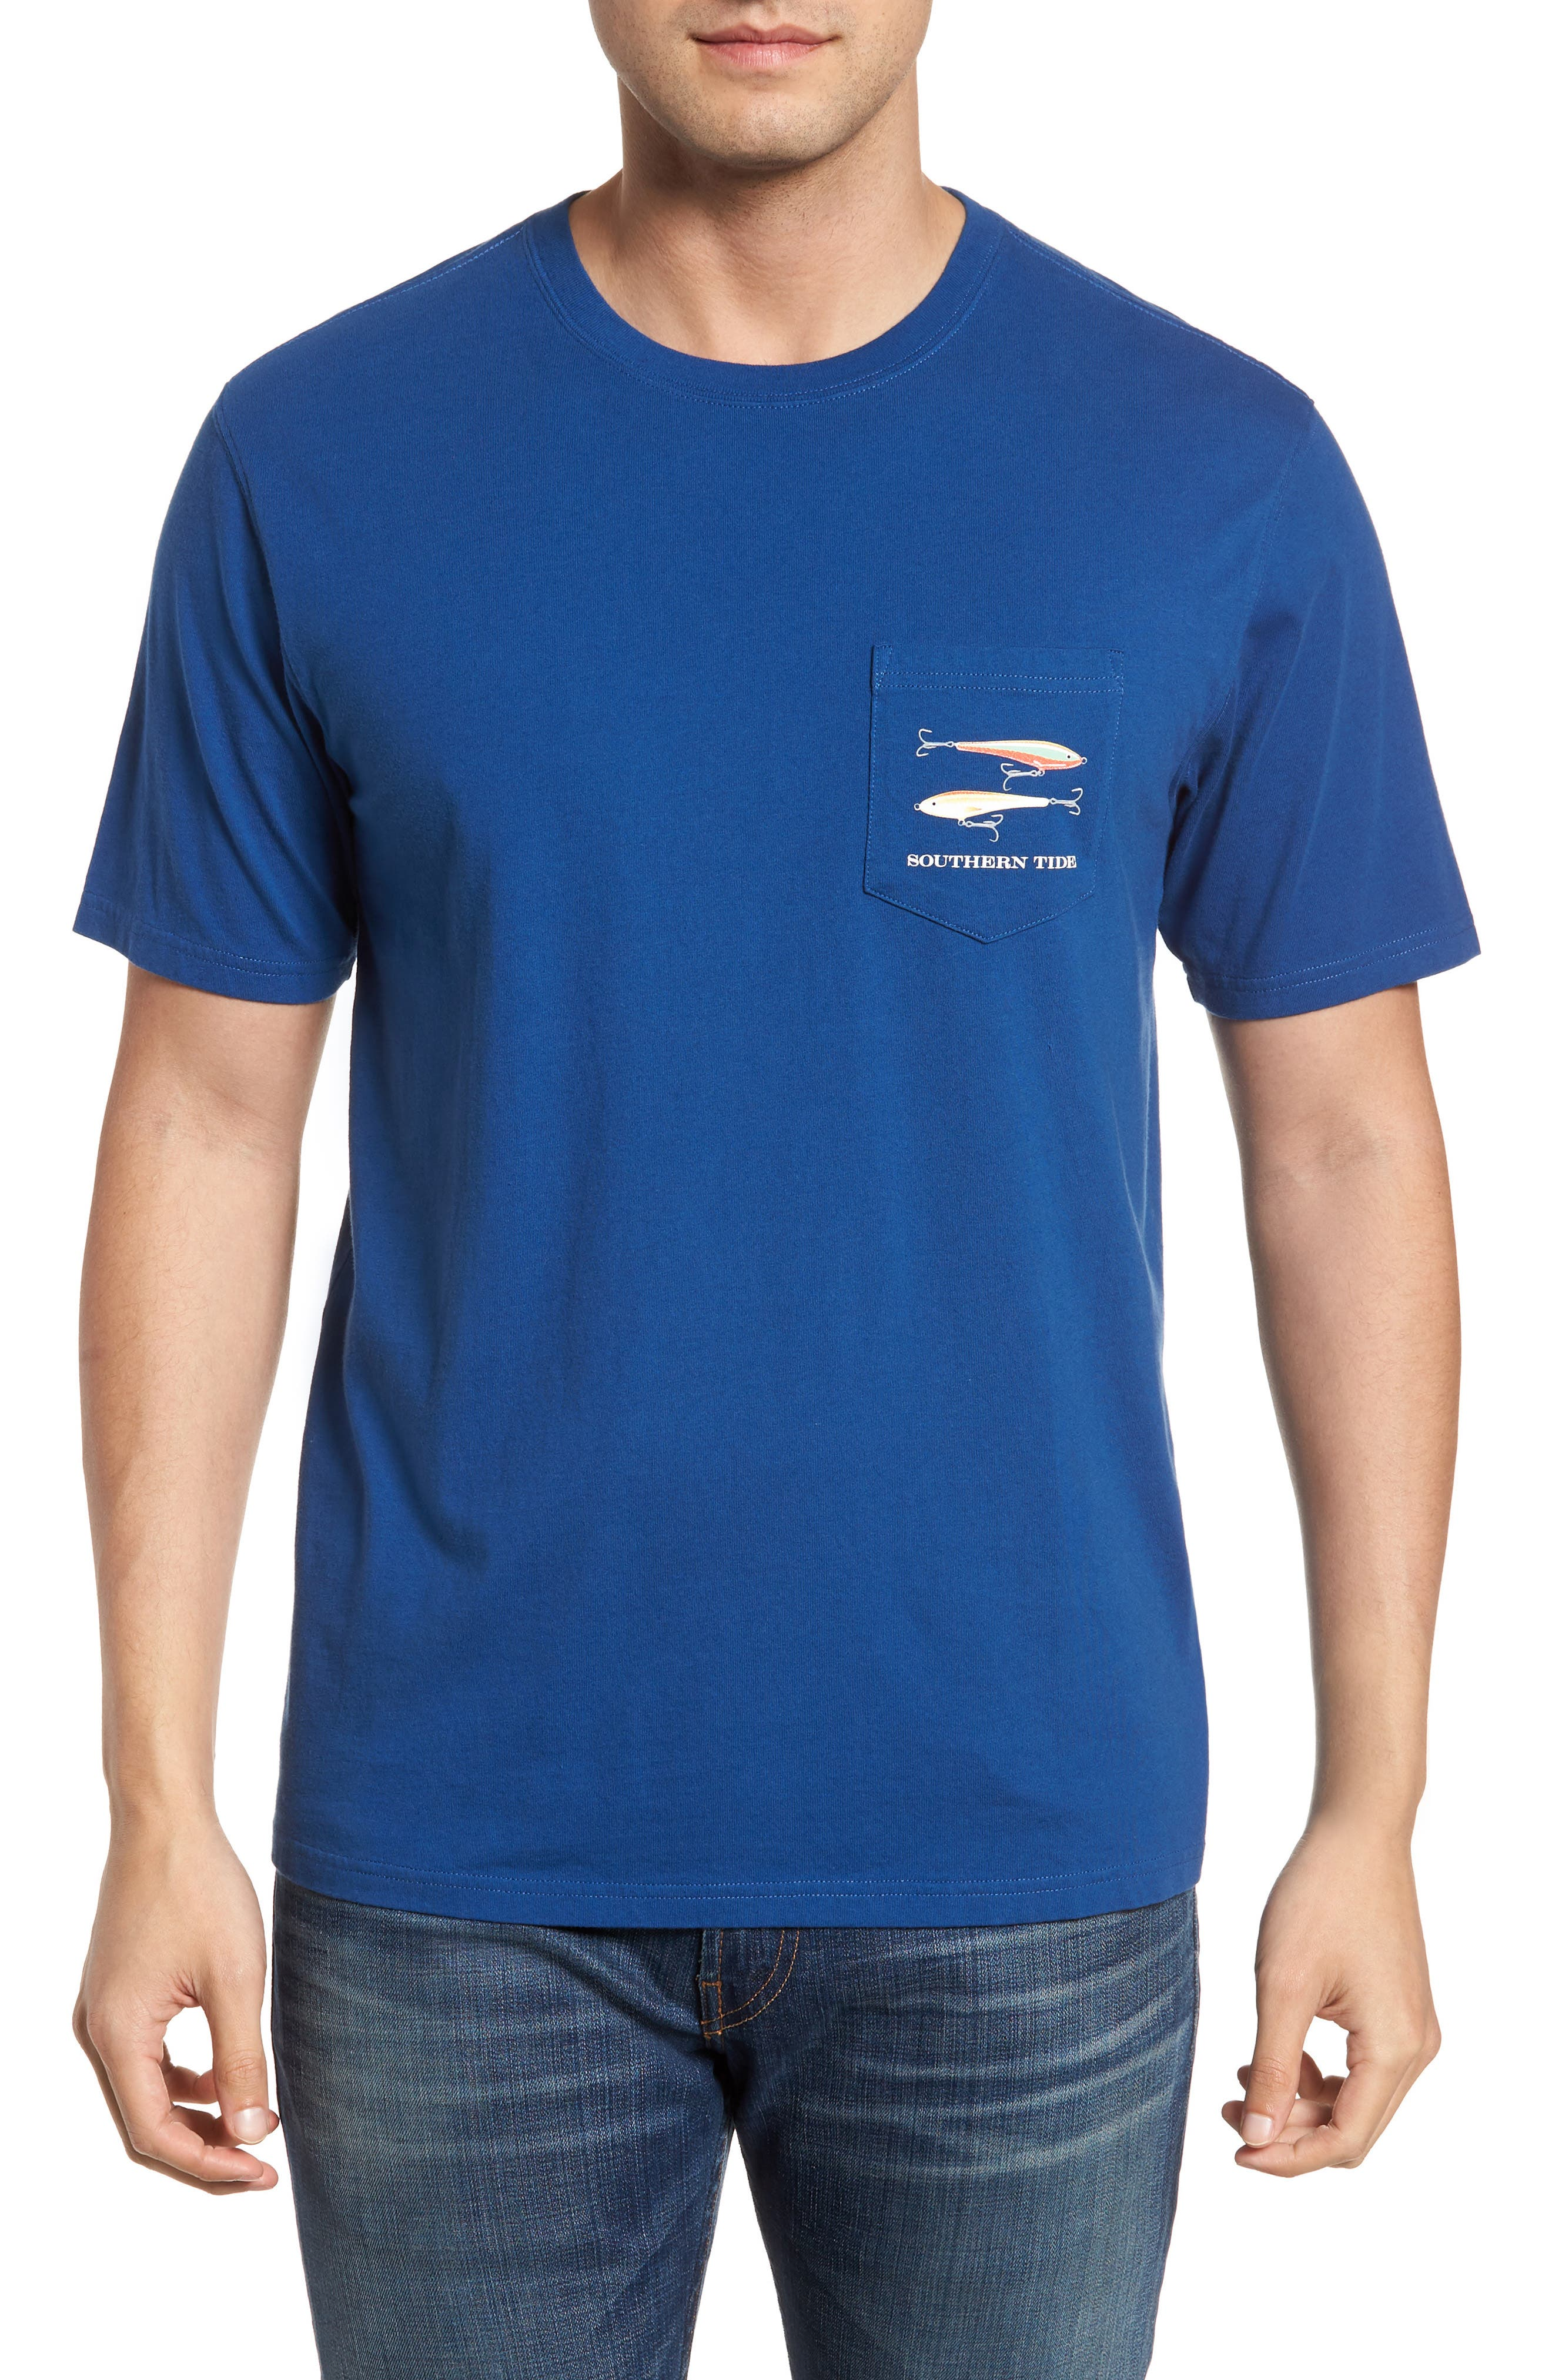 Hanging Out Regular Fit T-Shirt,                             Main thumbnail 1, color,                             440